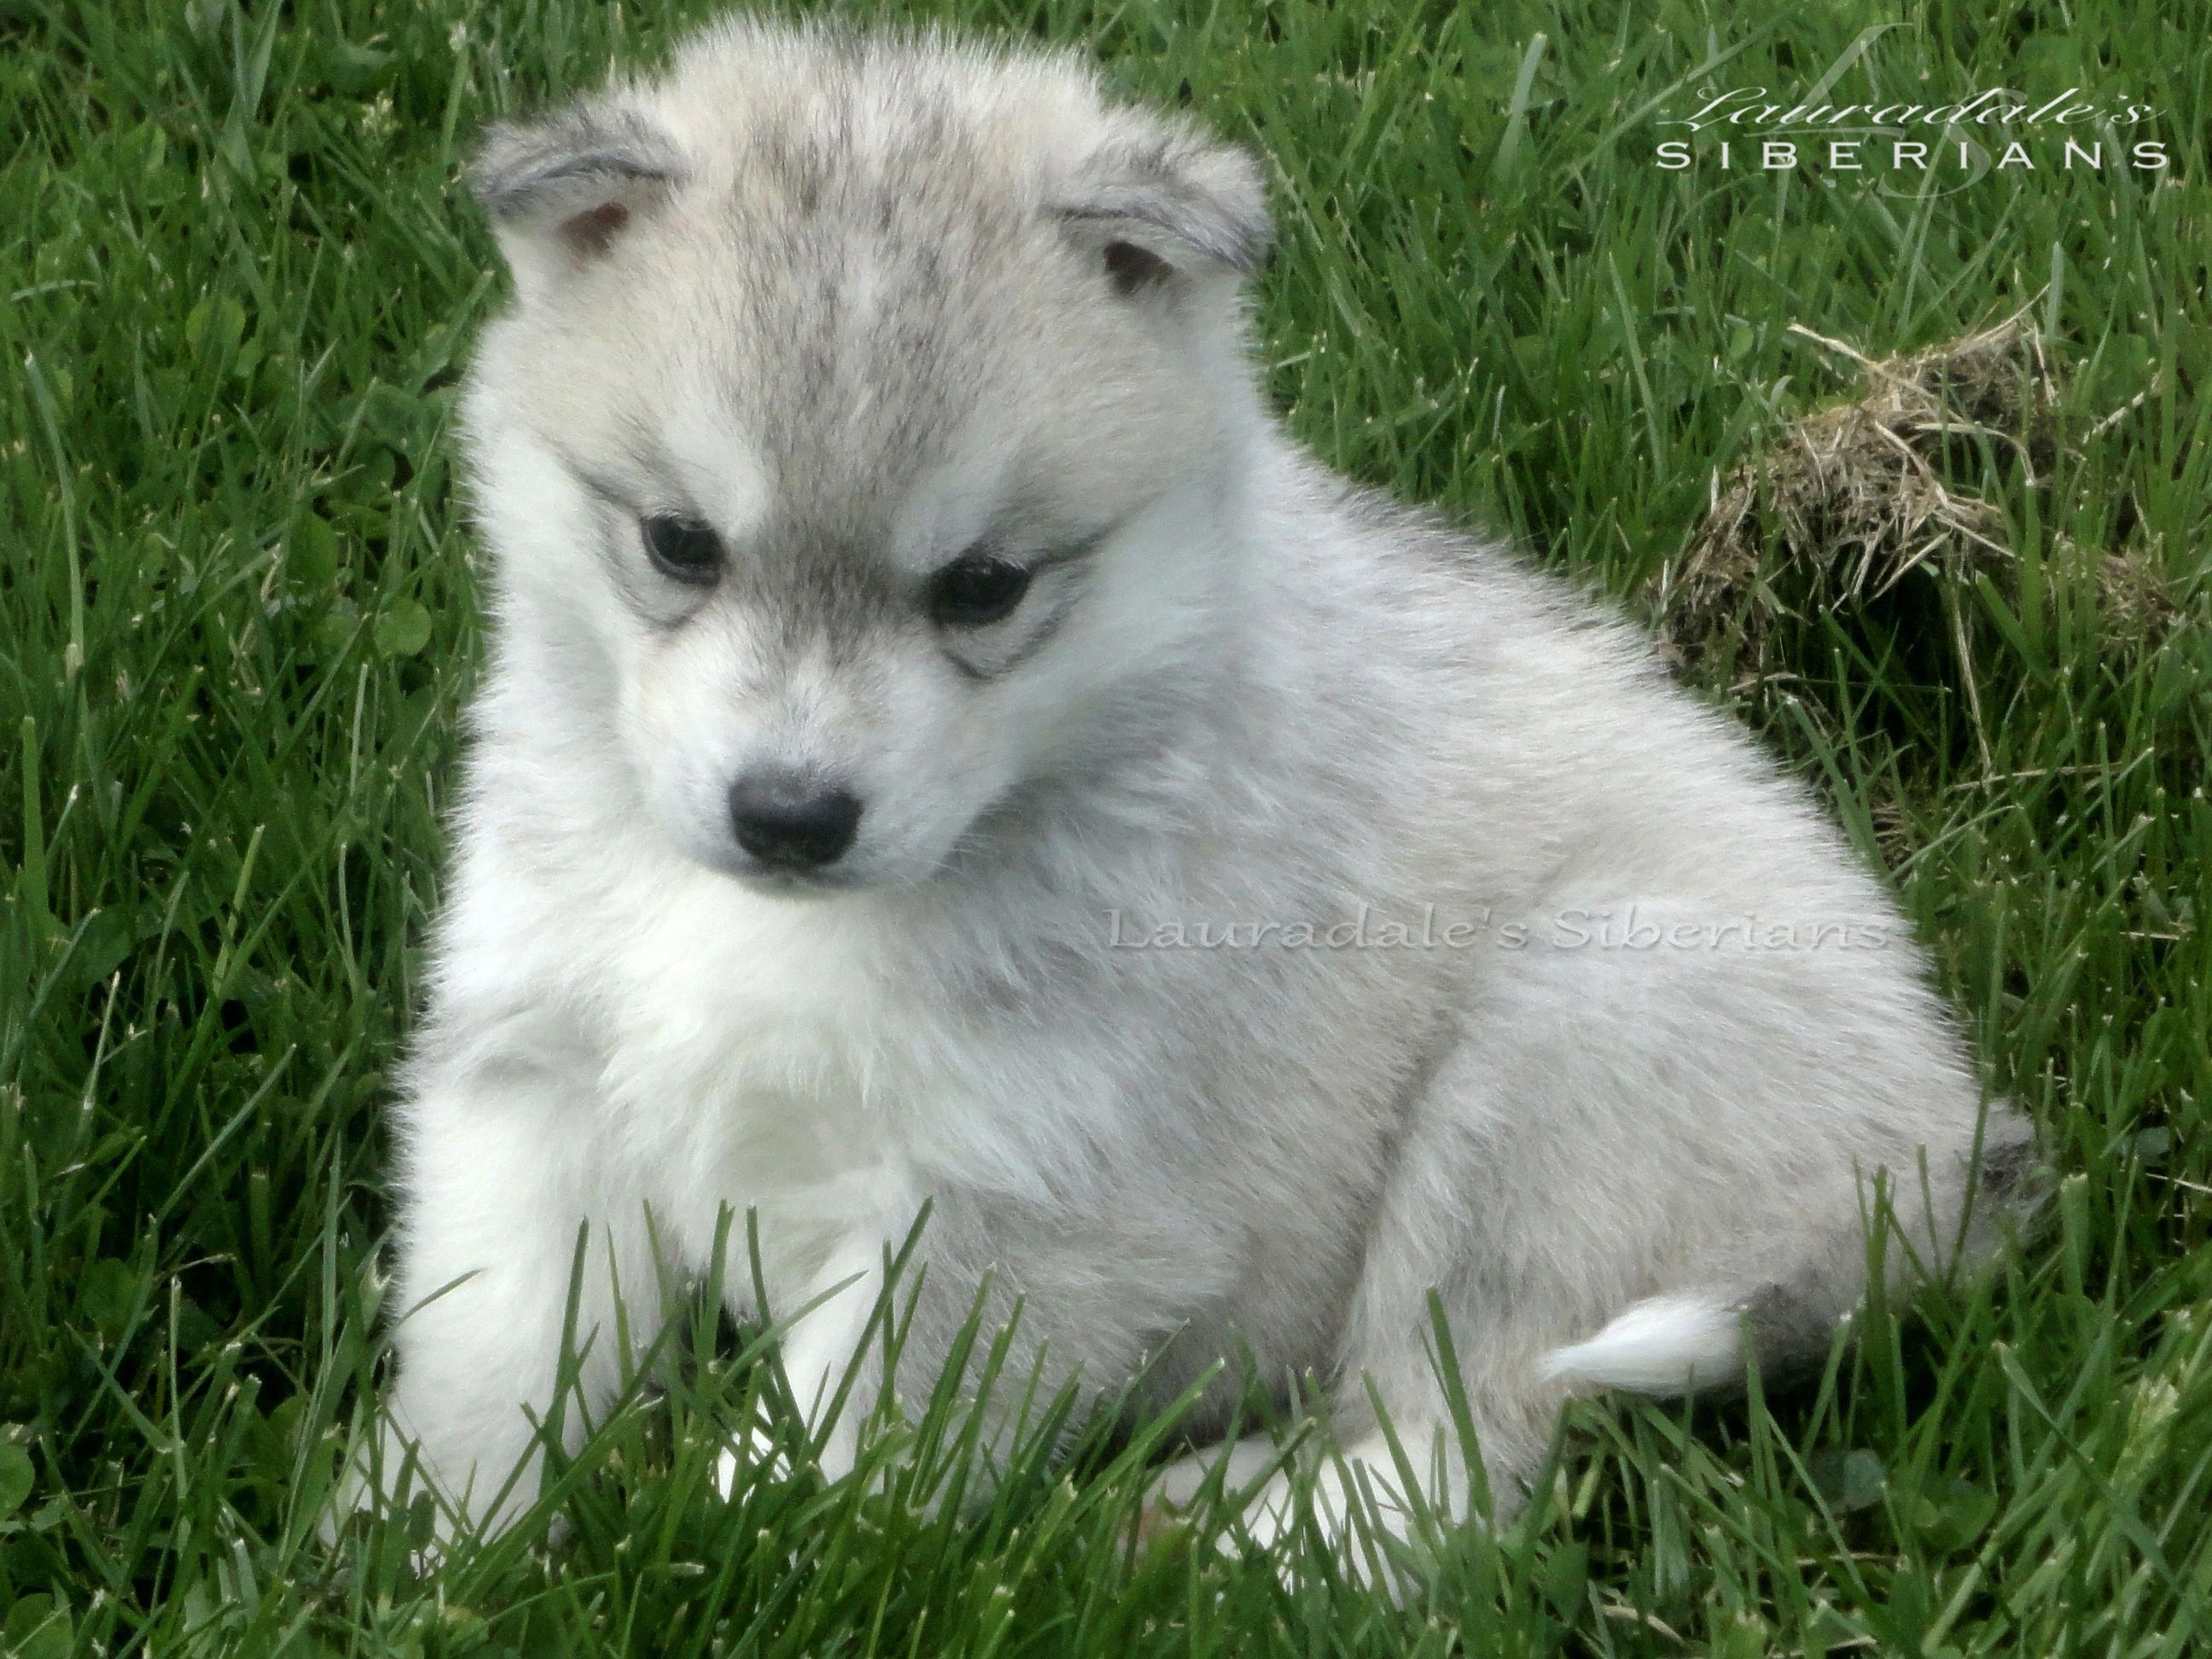 Rottweiler Puppy In 2020 Rottweiler Puppies Siberian Husky Puppies White Husky Puppy